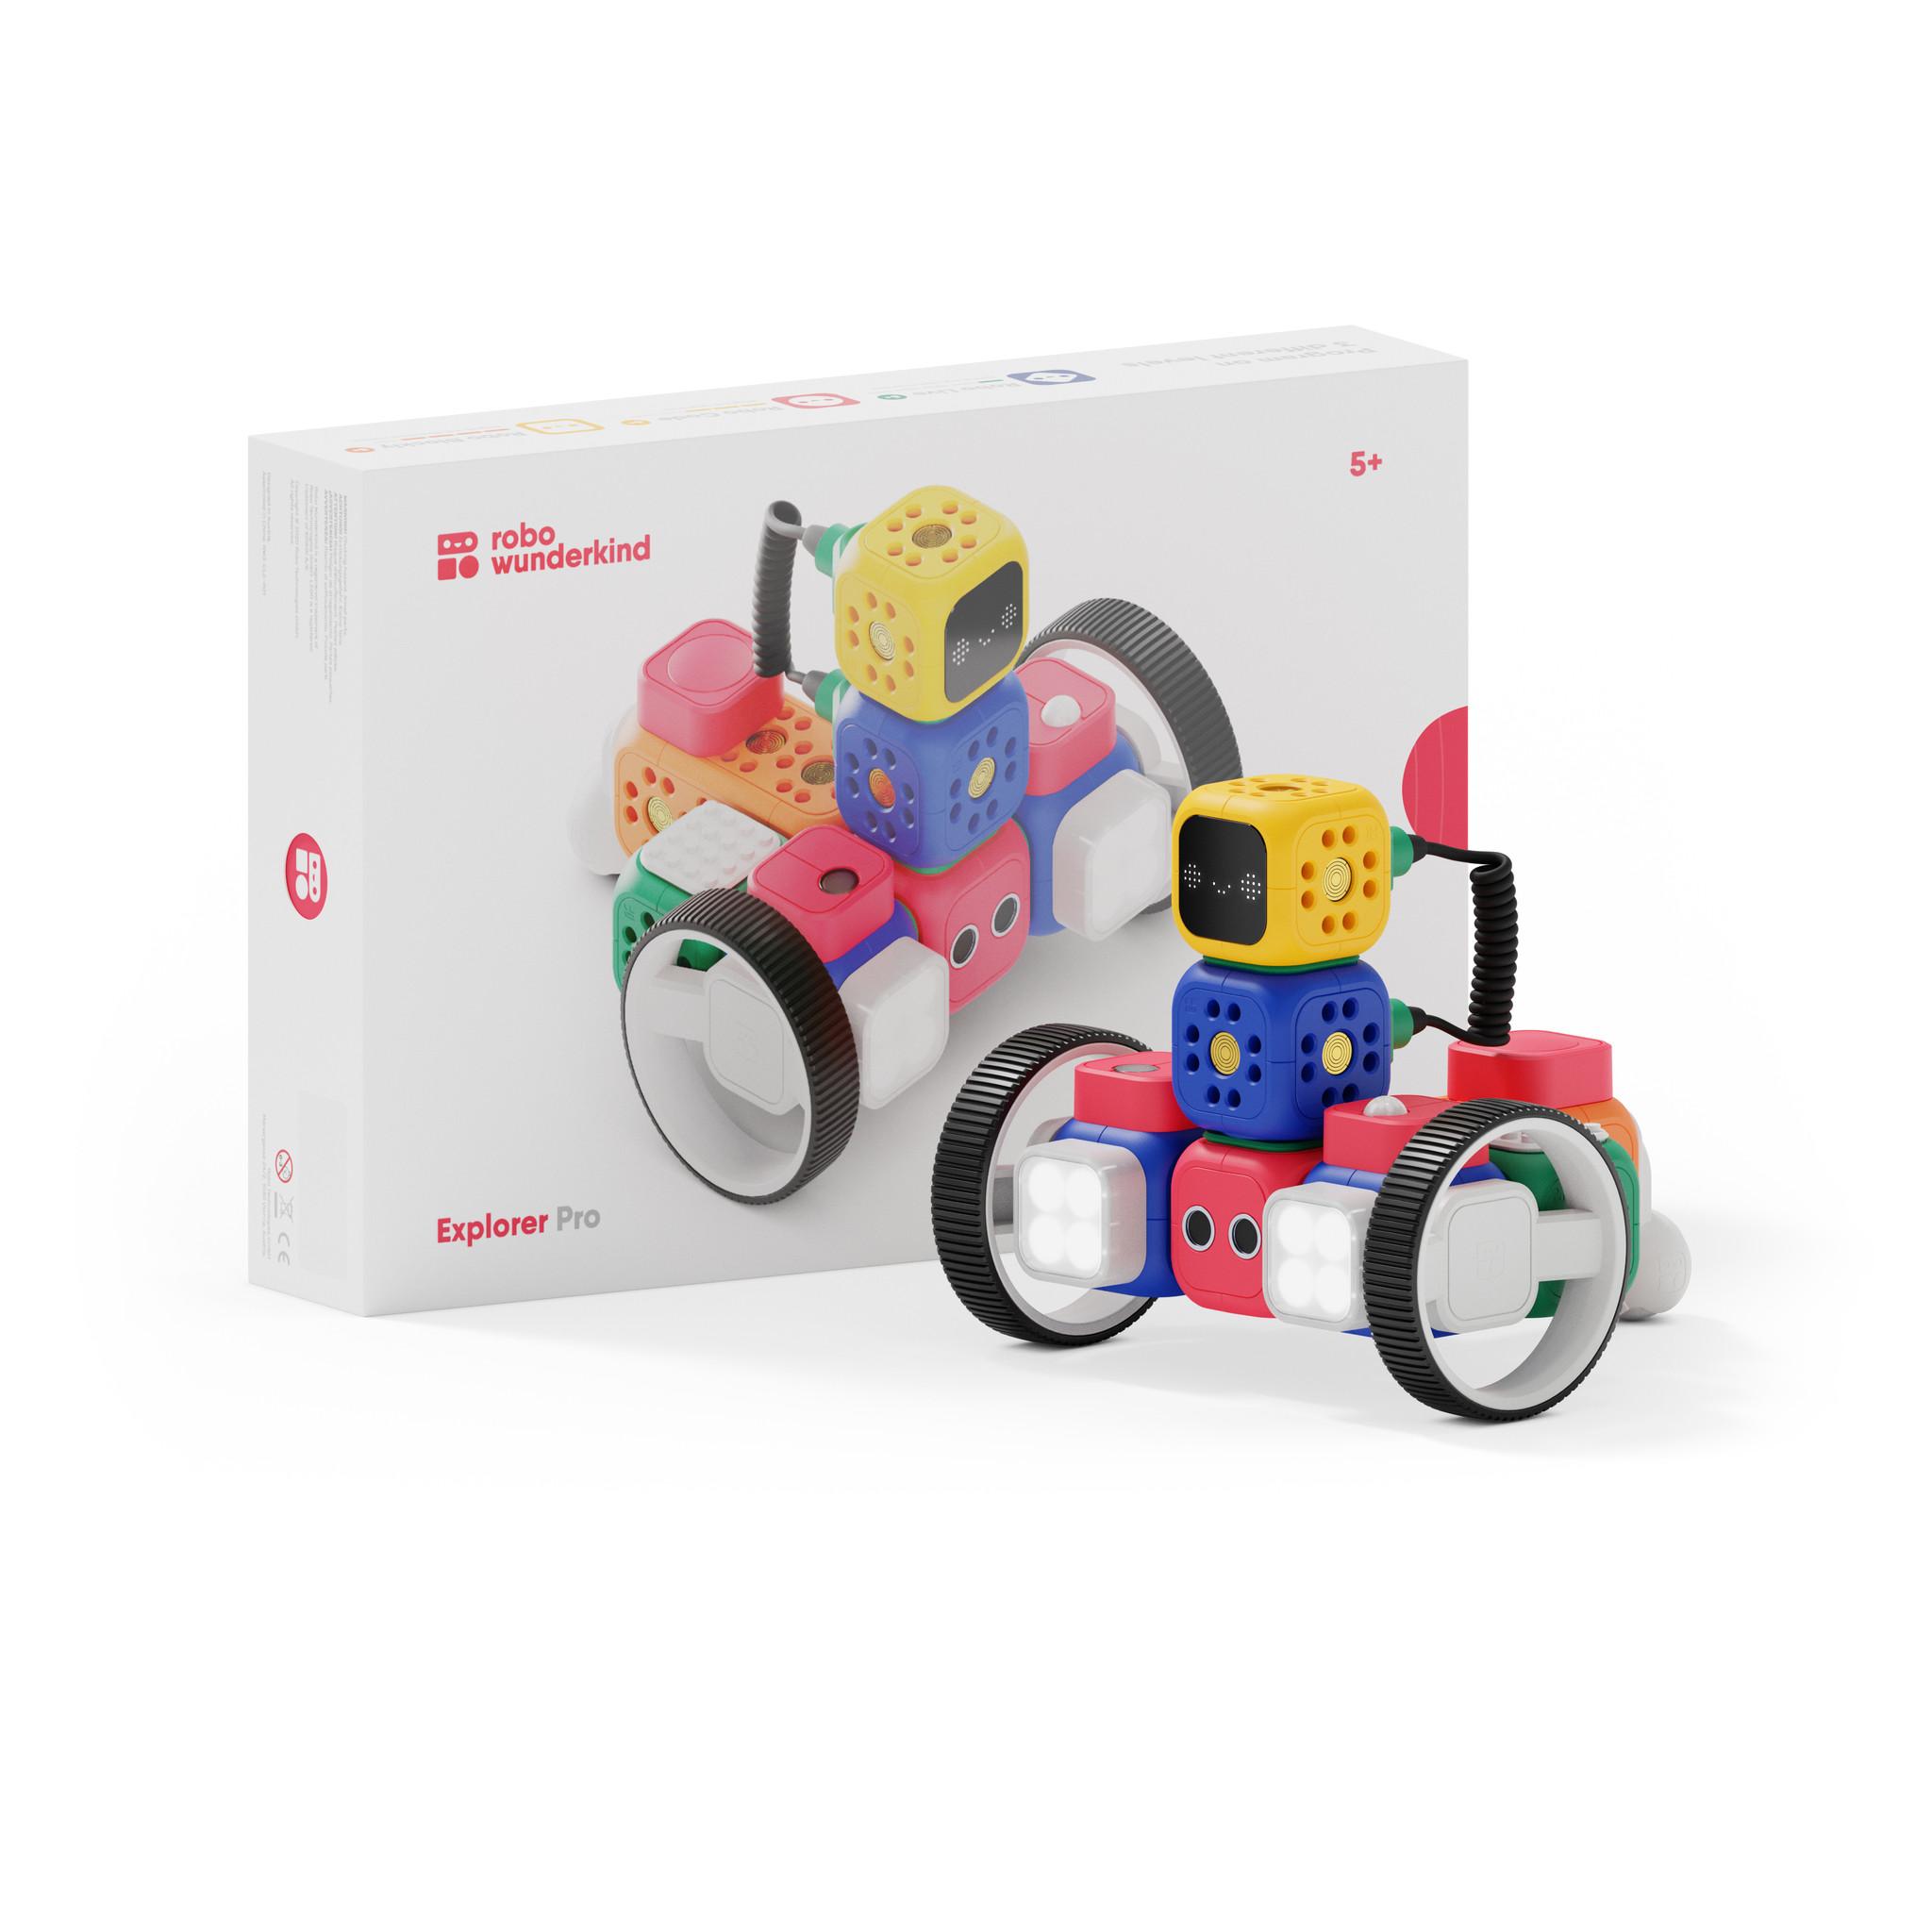 Robo Wunderkind Robo Wunderkind Explorer Pro kit